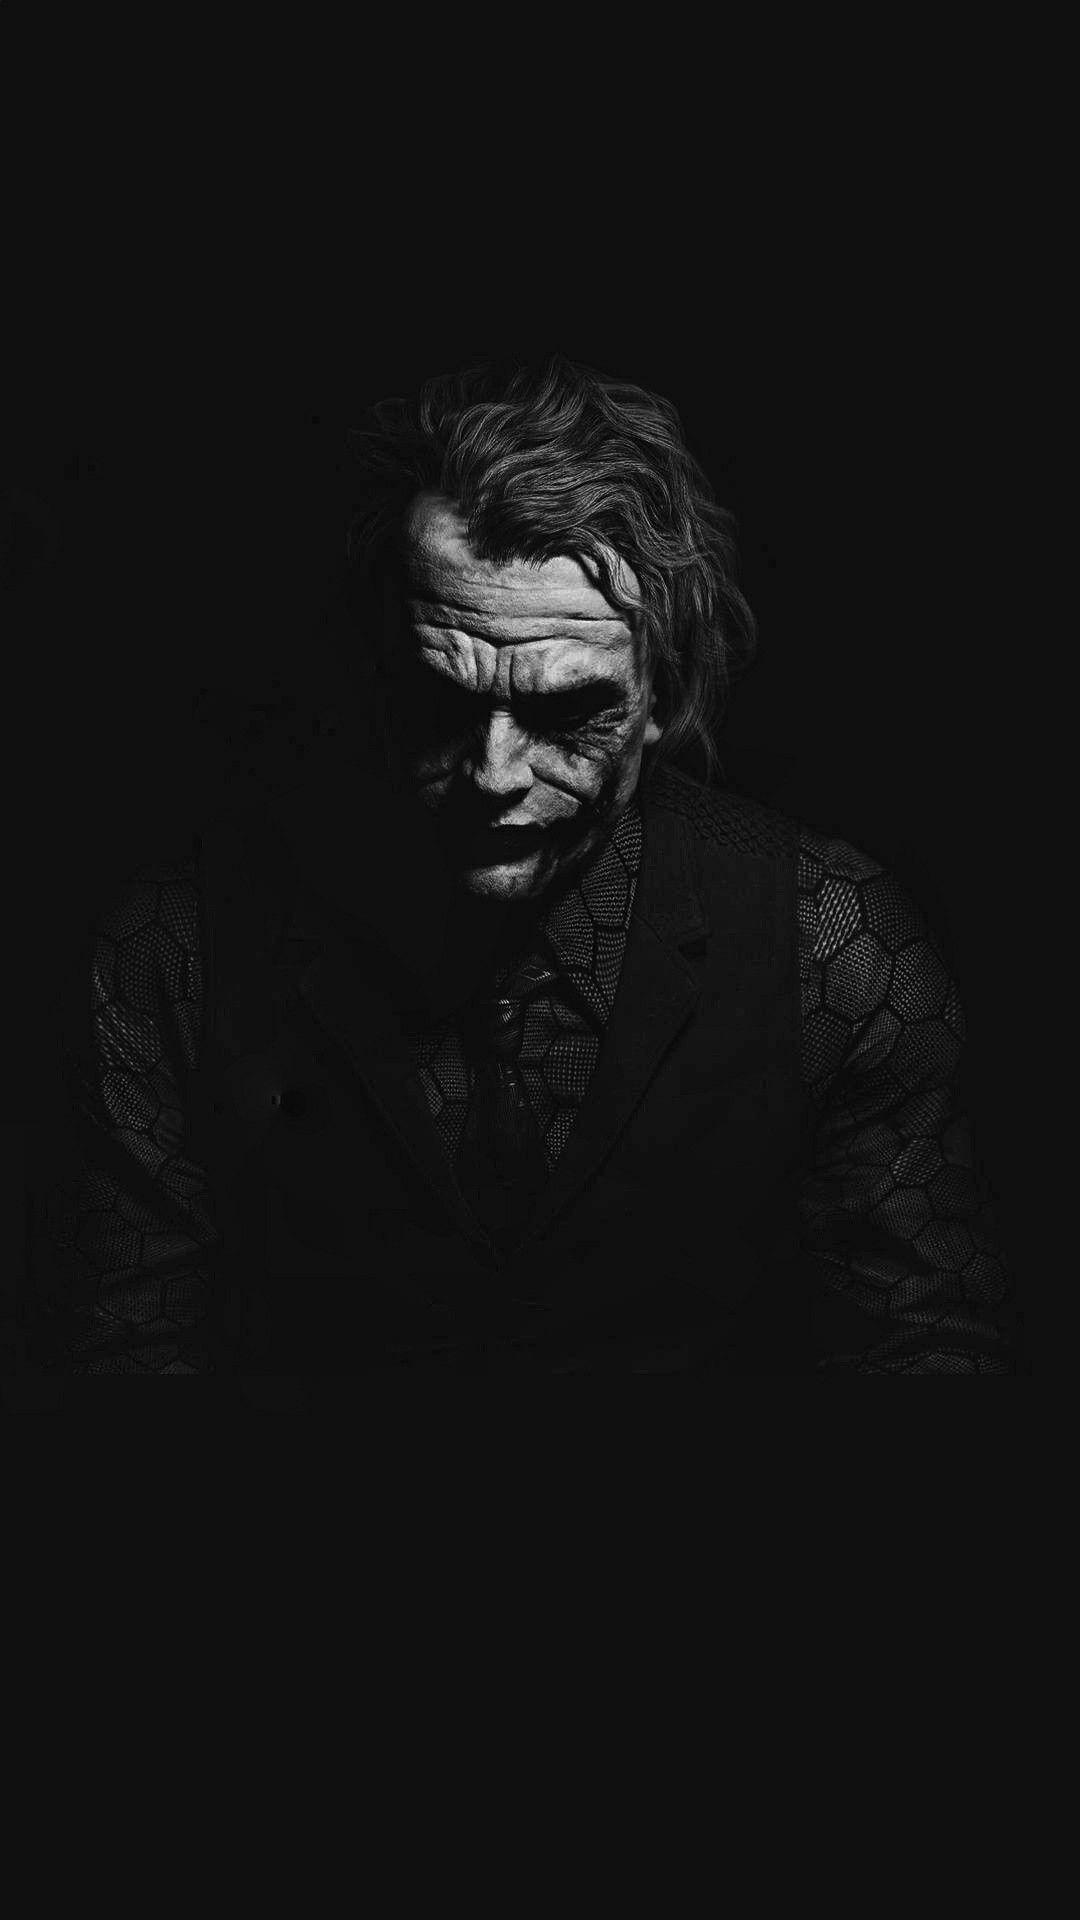 Dark Wallpaper Hupages Download Iphone Wallpapers Batman Joker Wallpaper Joker Pics Joker Iphone Wallpaper